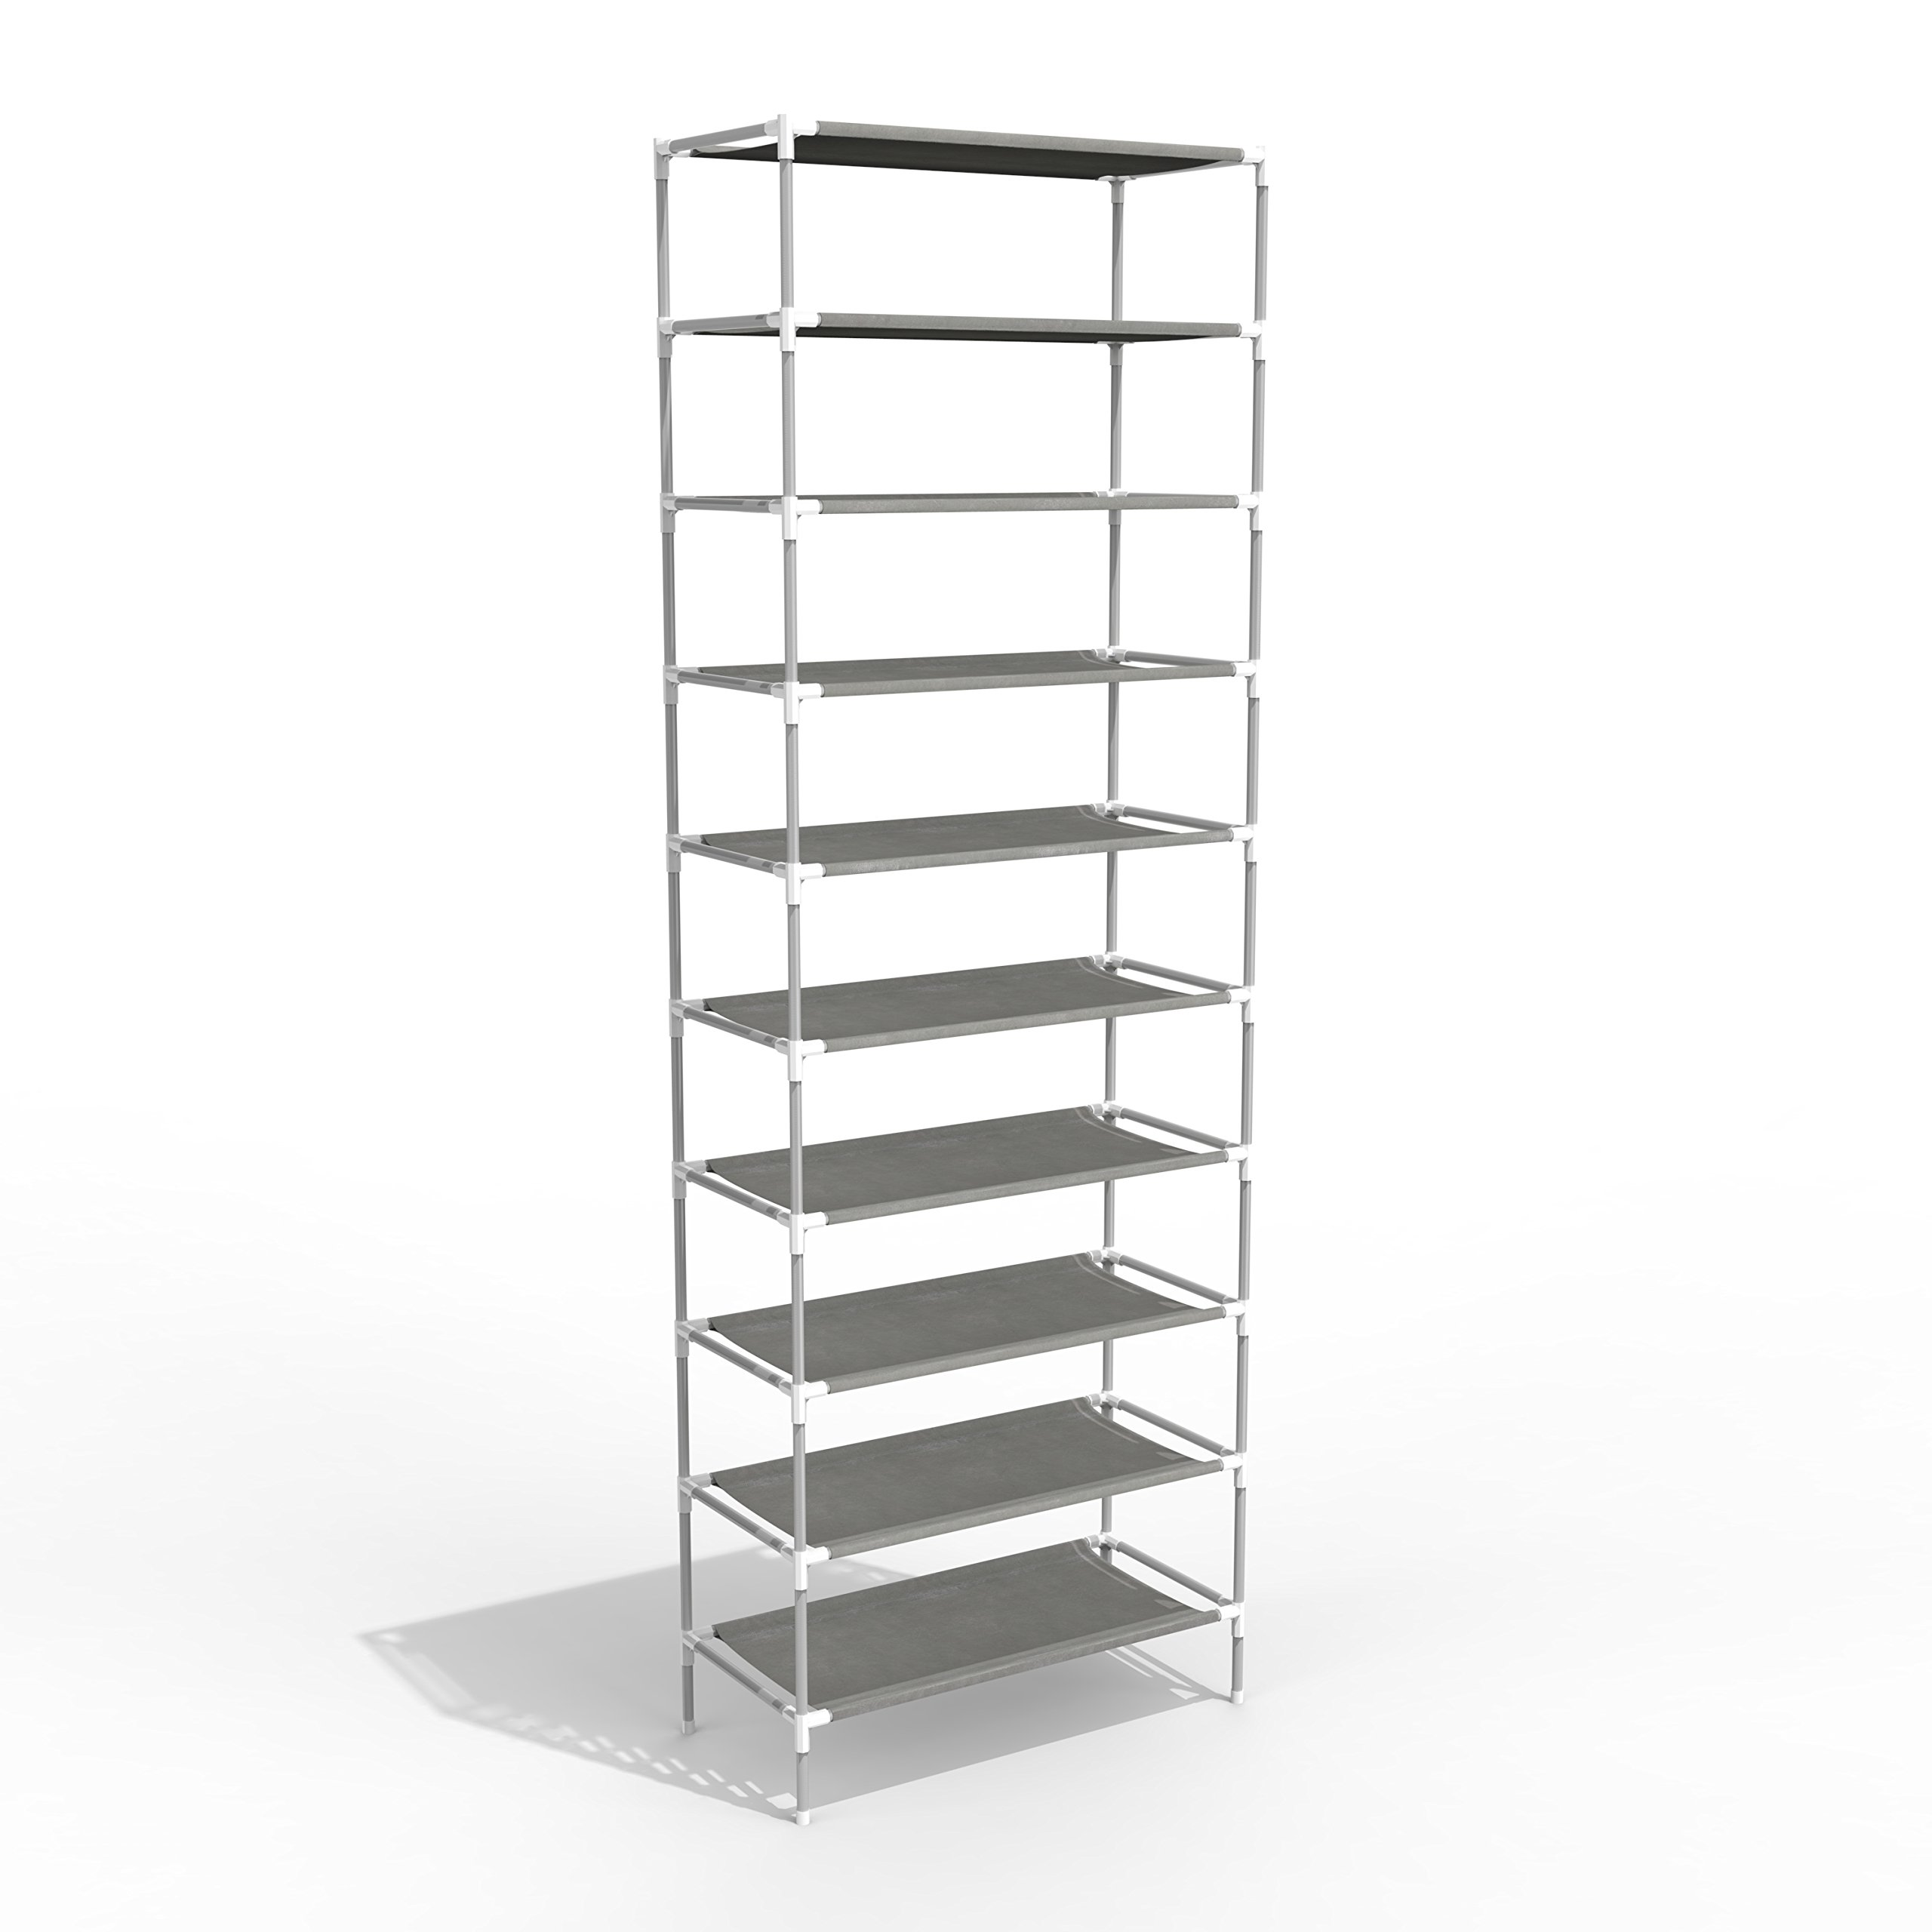 SONGMICS 10-Tier Shoe Tower Rack with Cover 27-Pair Space Saving Shoe Storage Organizer Grey URXJ10G